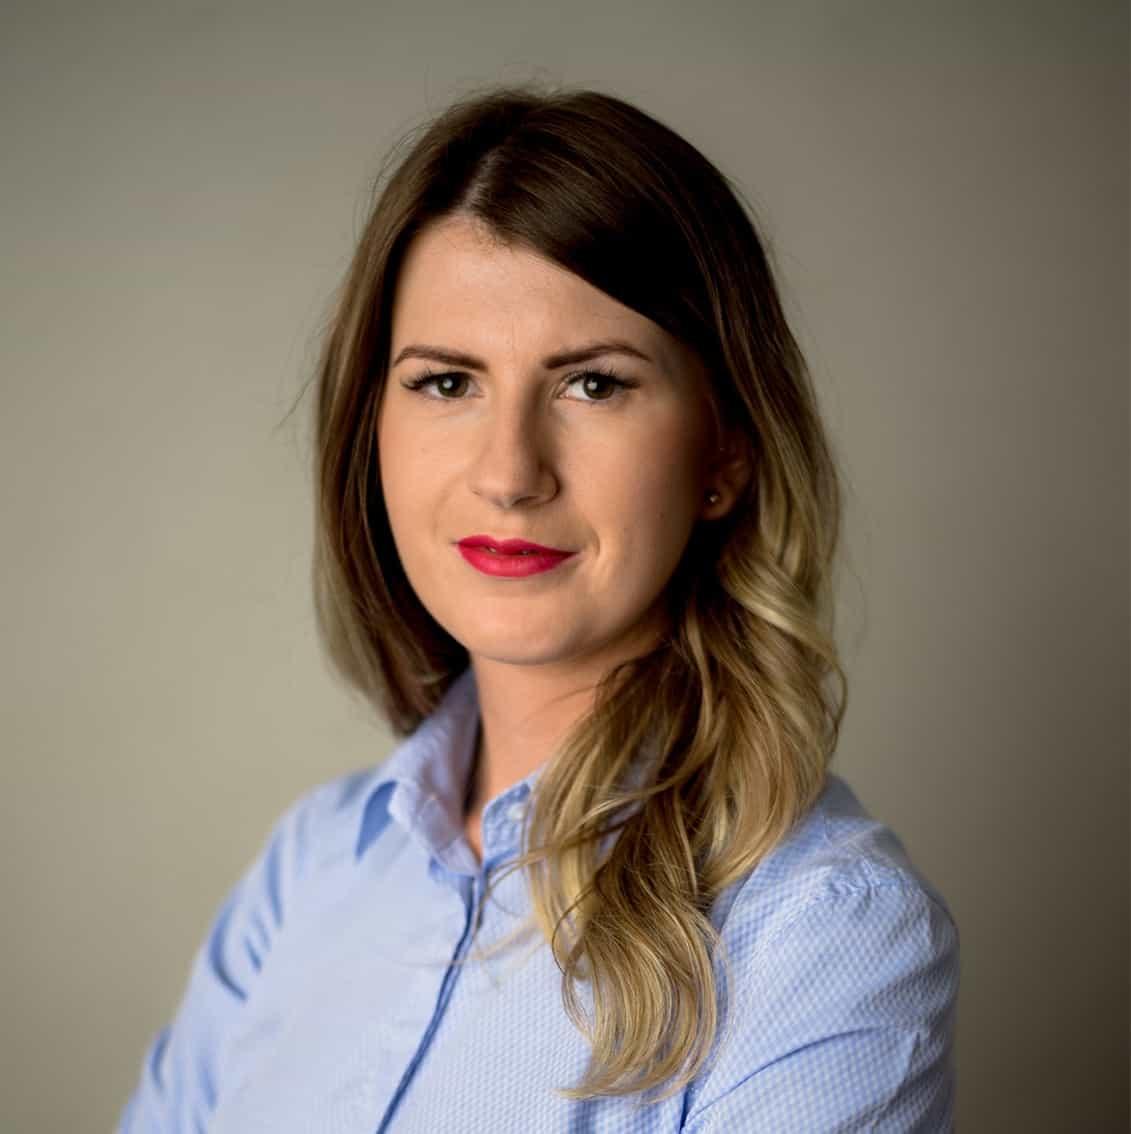 Marta Majcher